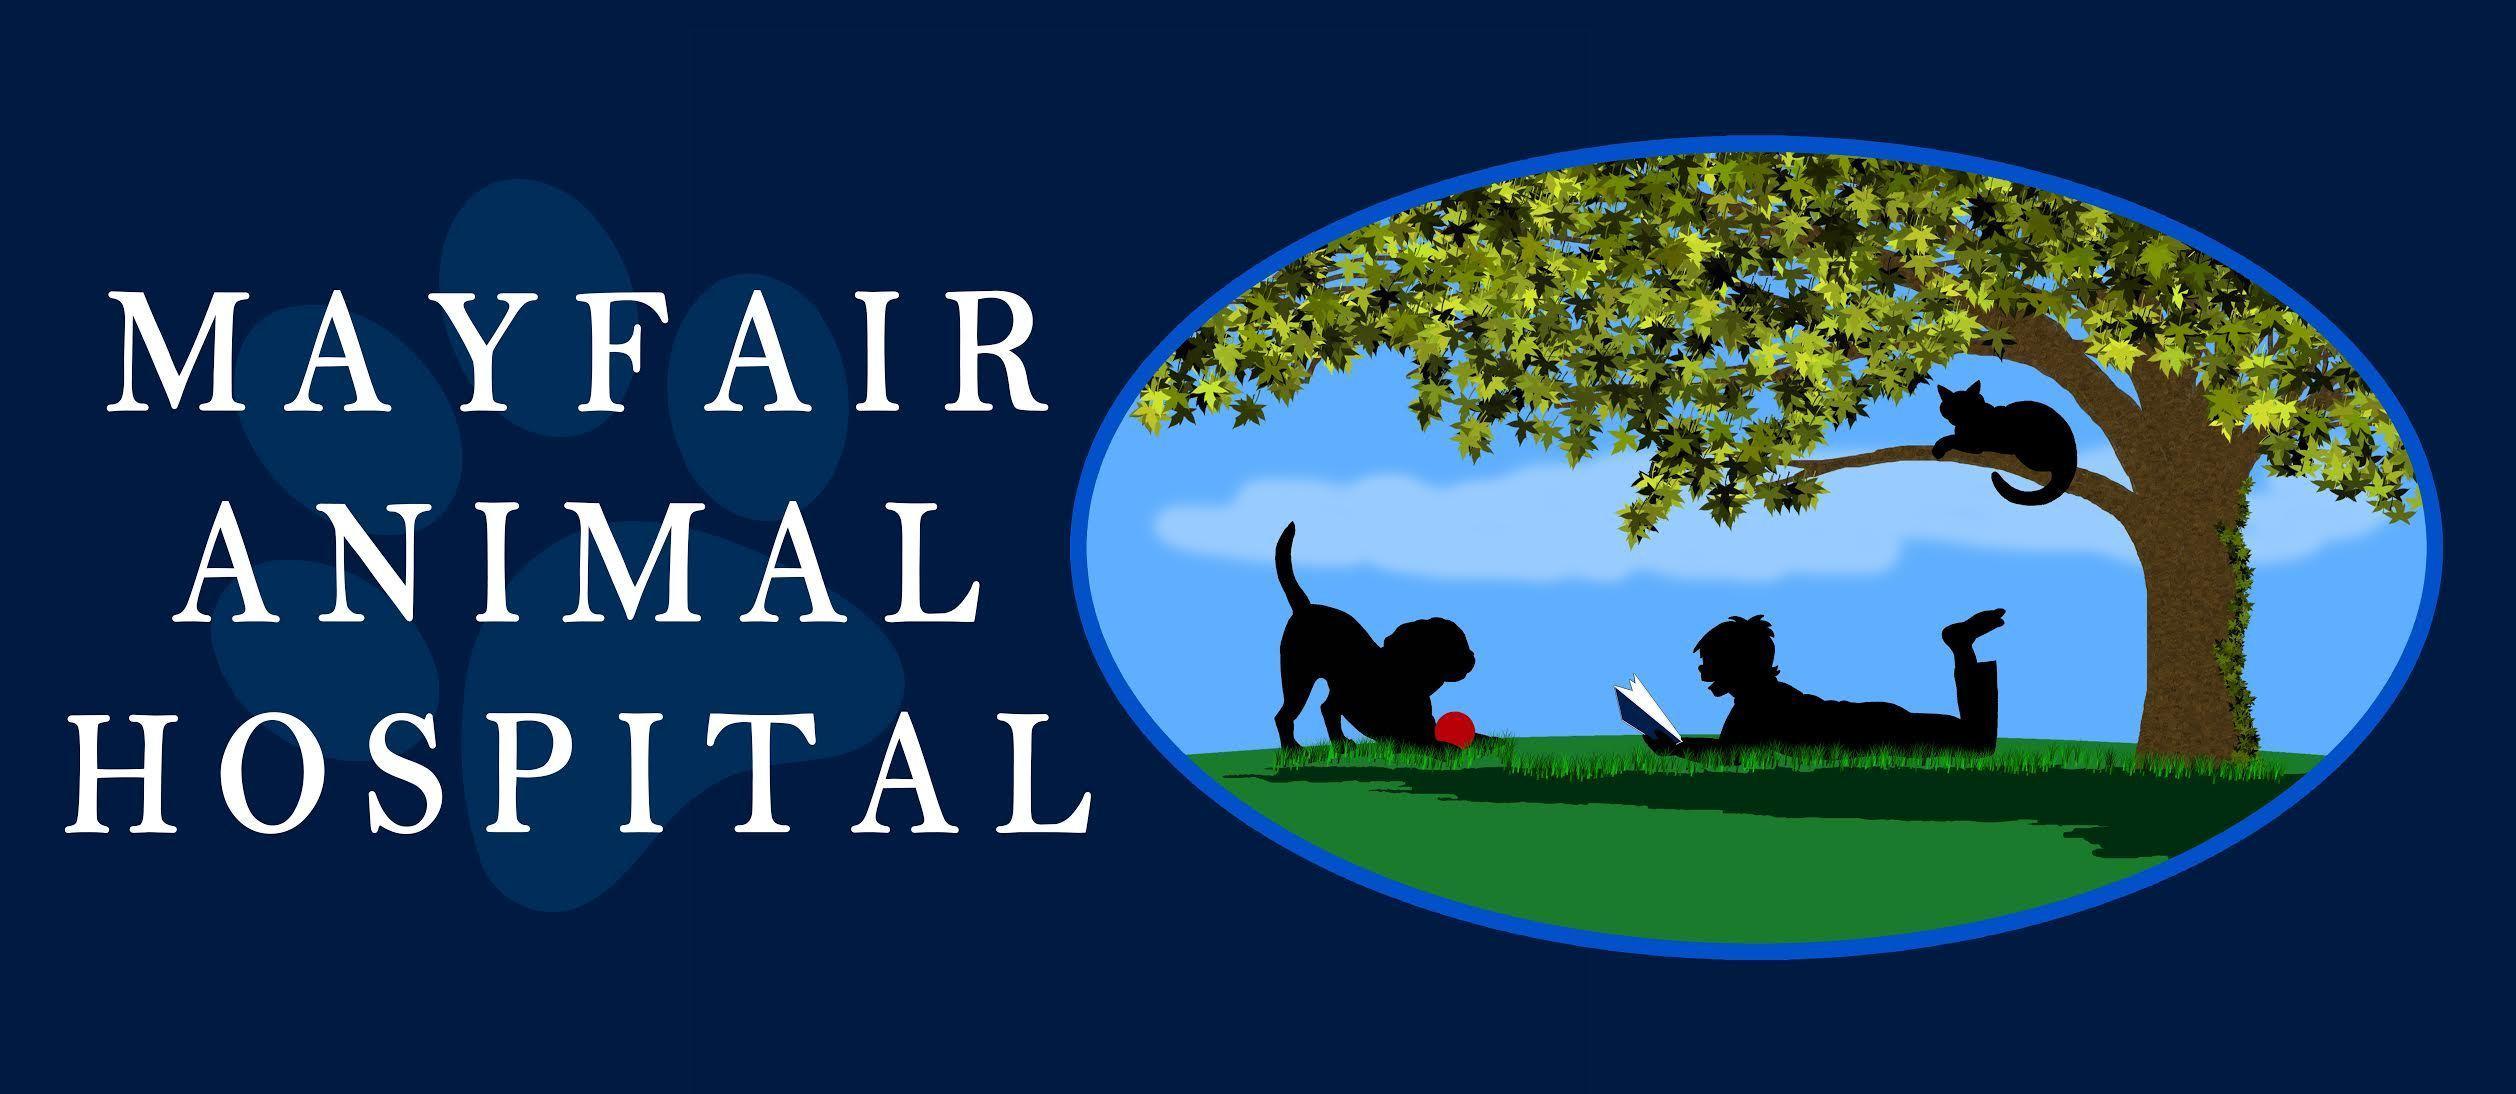 Mayfair Animal Hospital logo